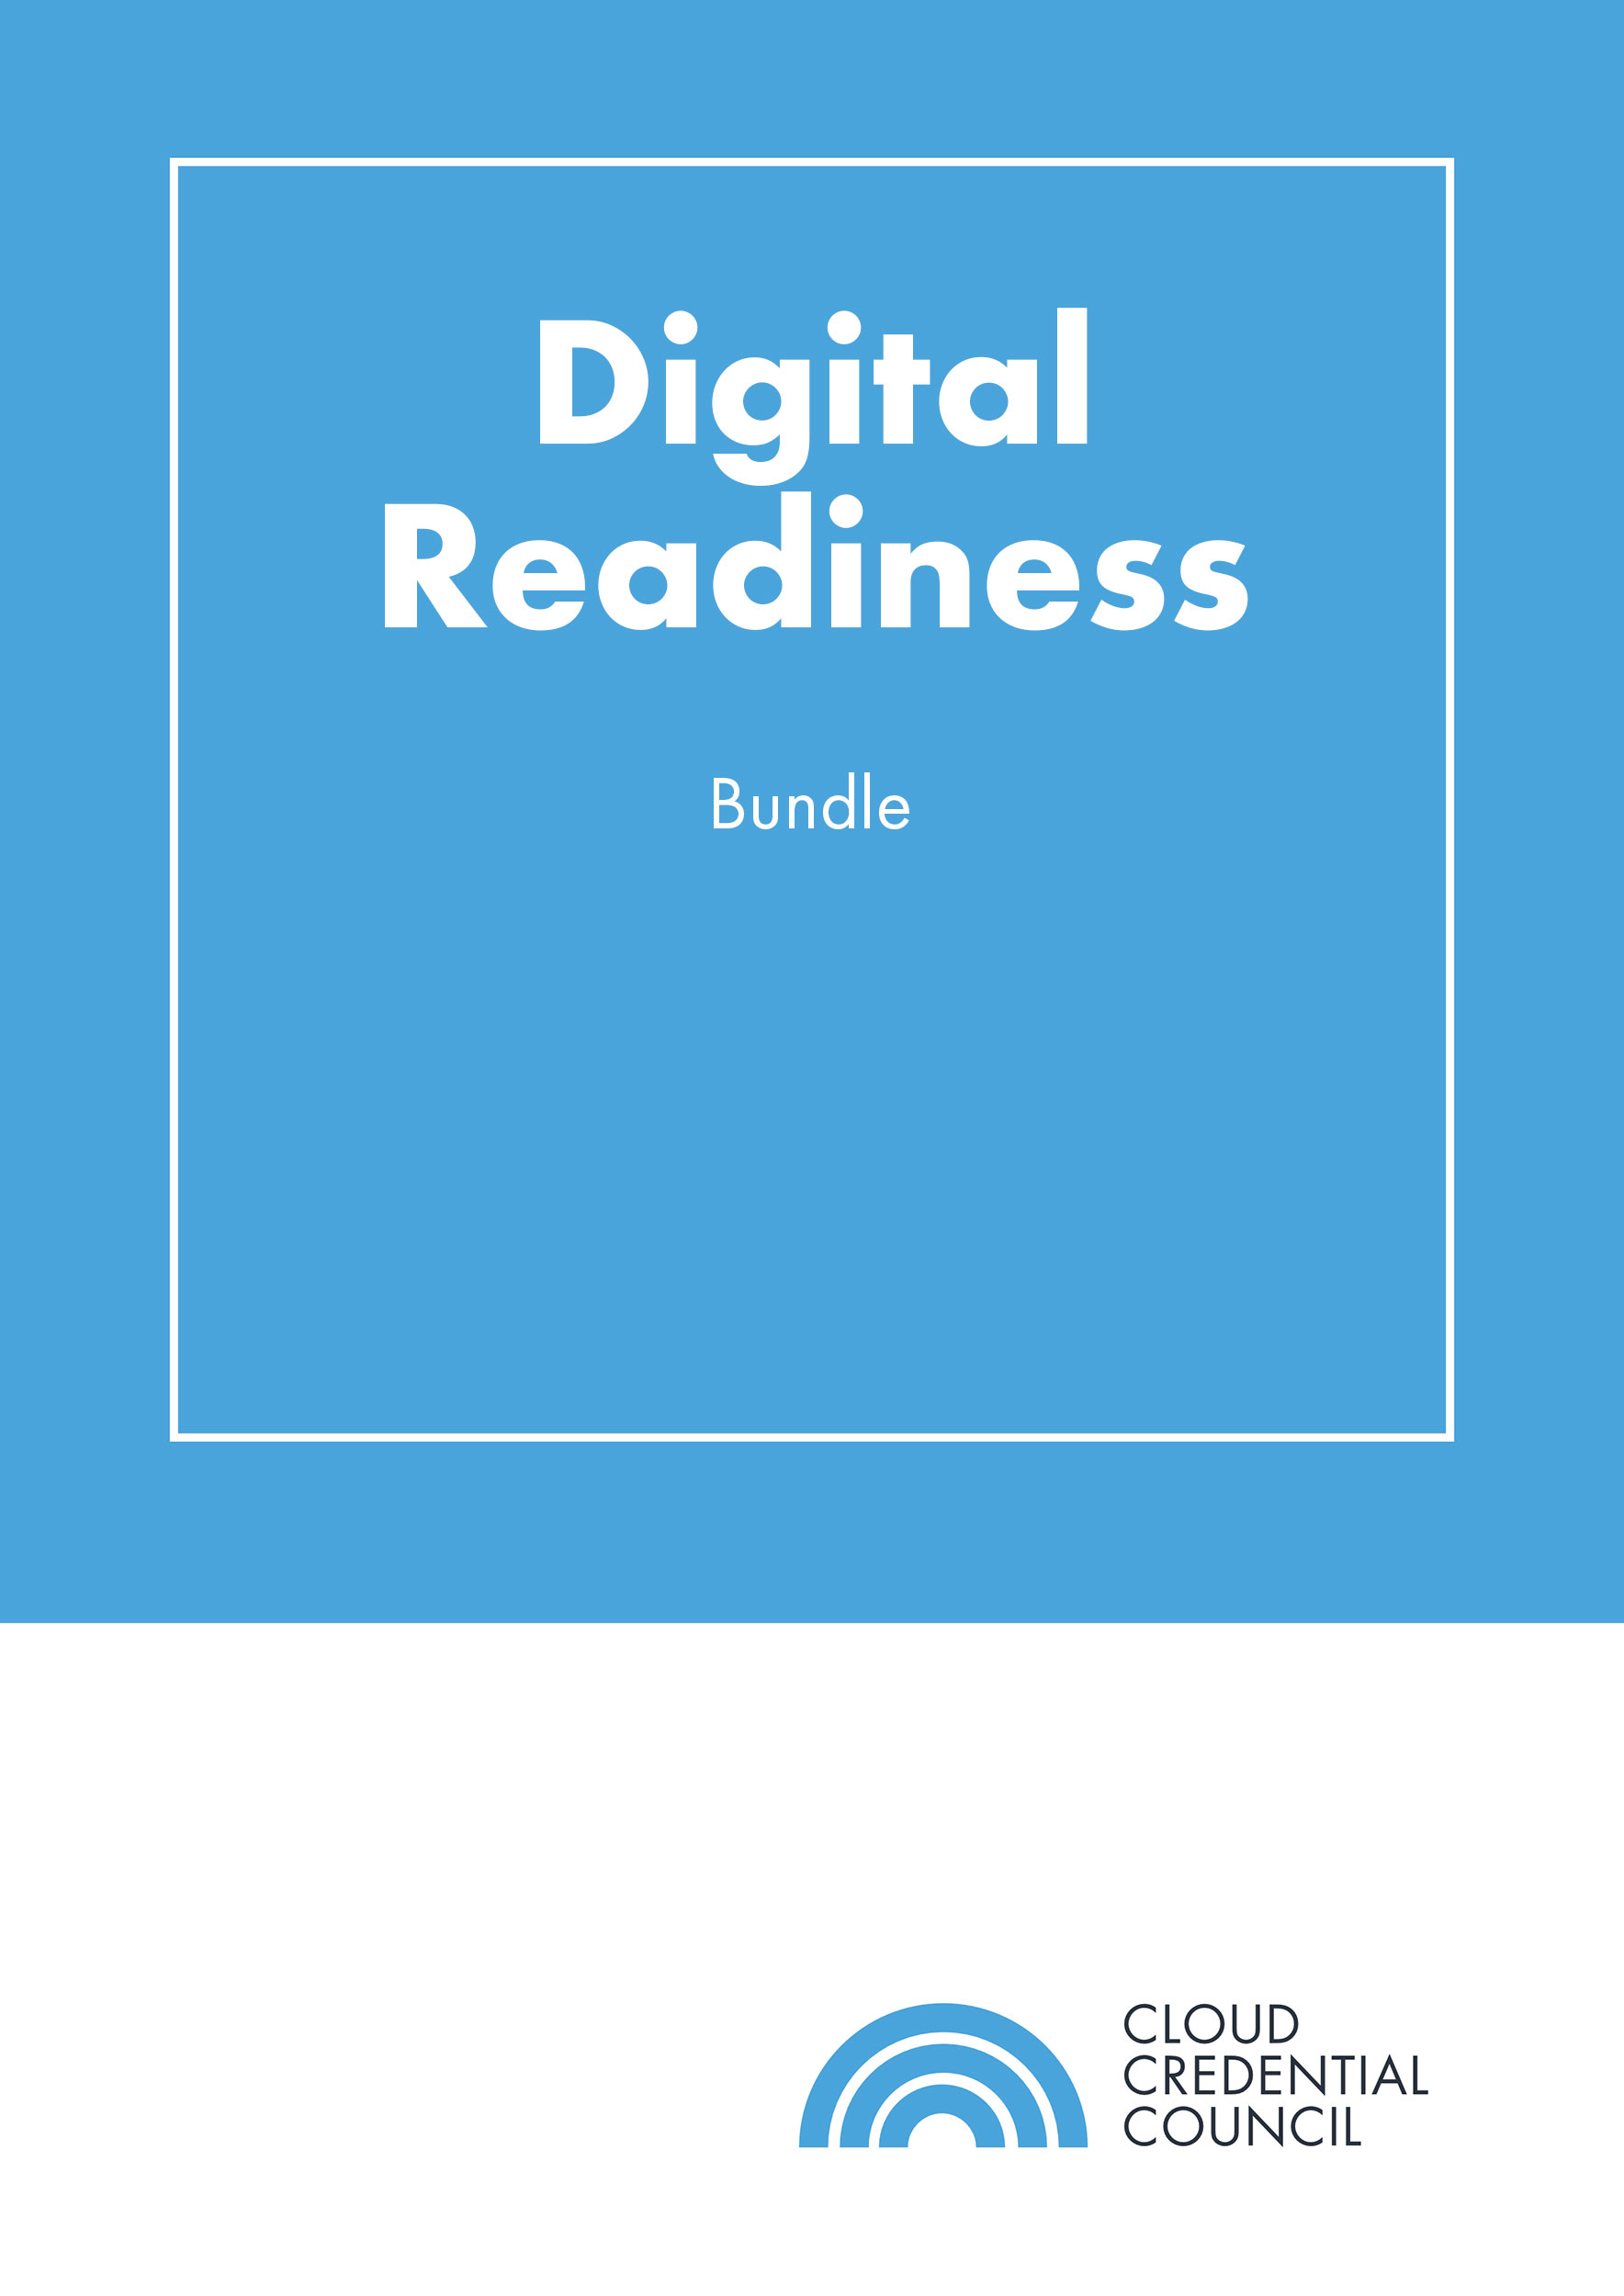 Digital-Readiness-Certification-Bundle